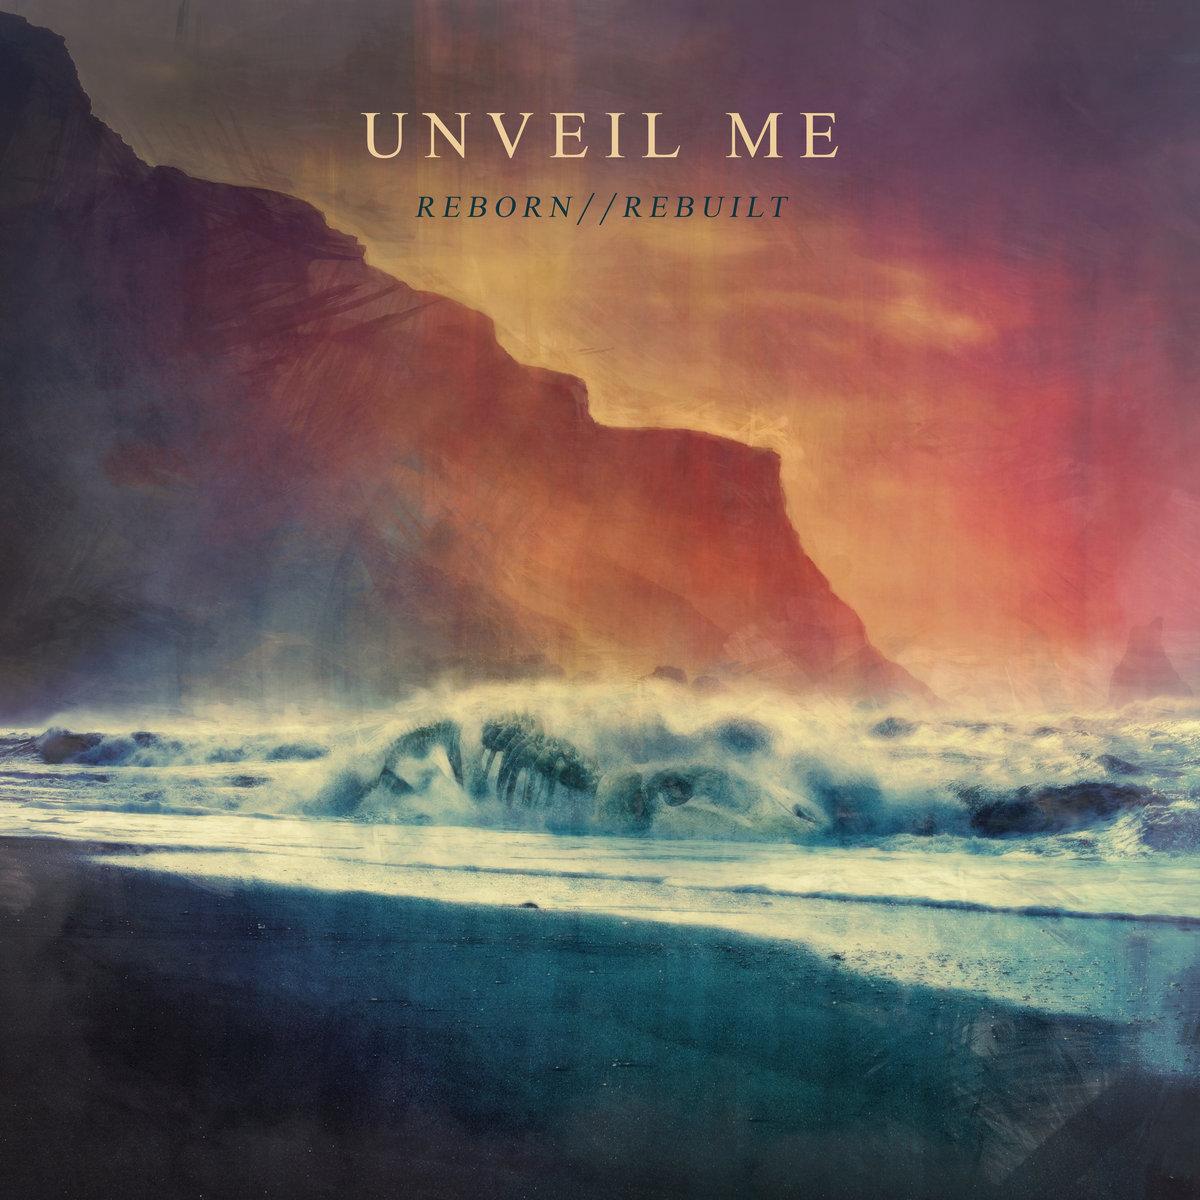 Unveil Me - Reborn//Rebuilt [EP] (2018)